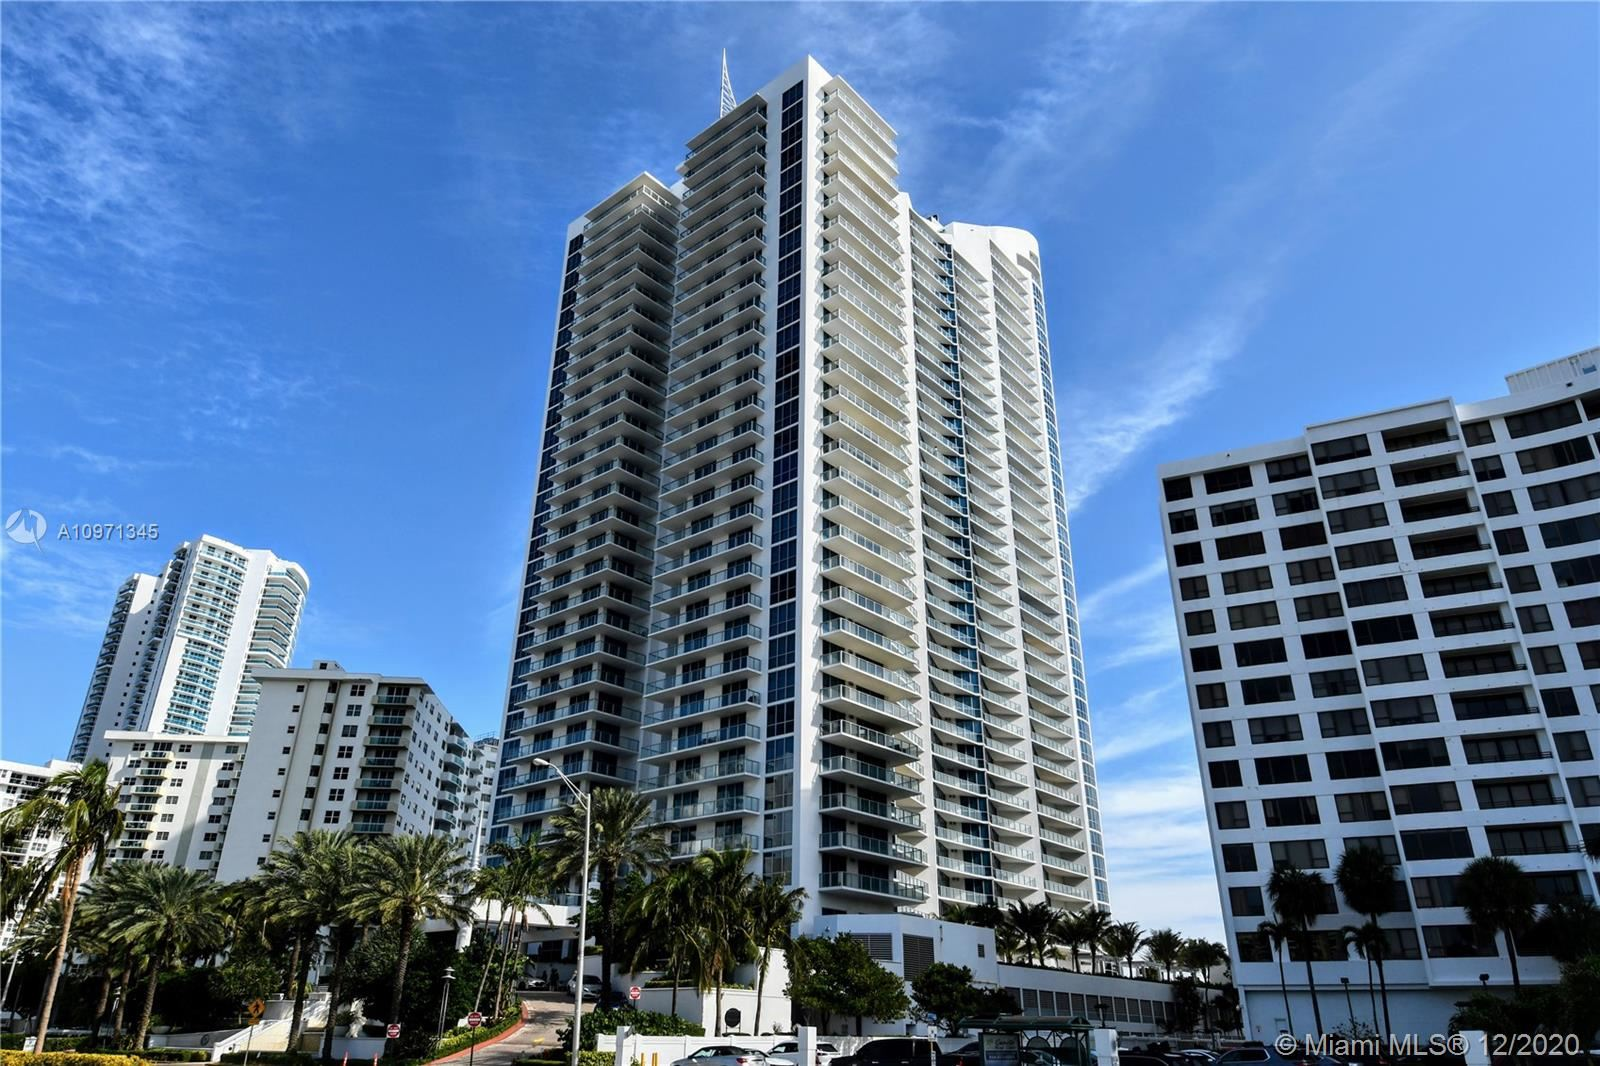 3101 S Ocean Dr #1608, Hollywood, FL 33019 - #: A10971345